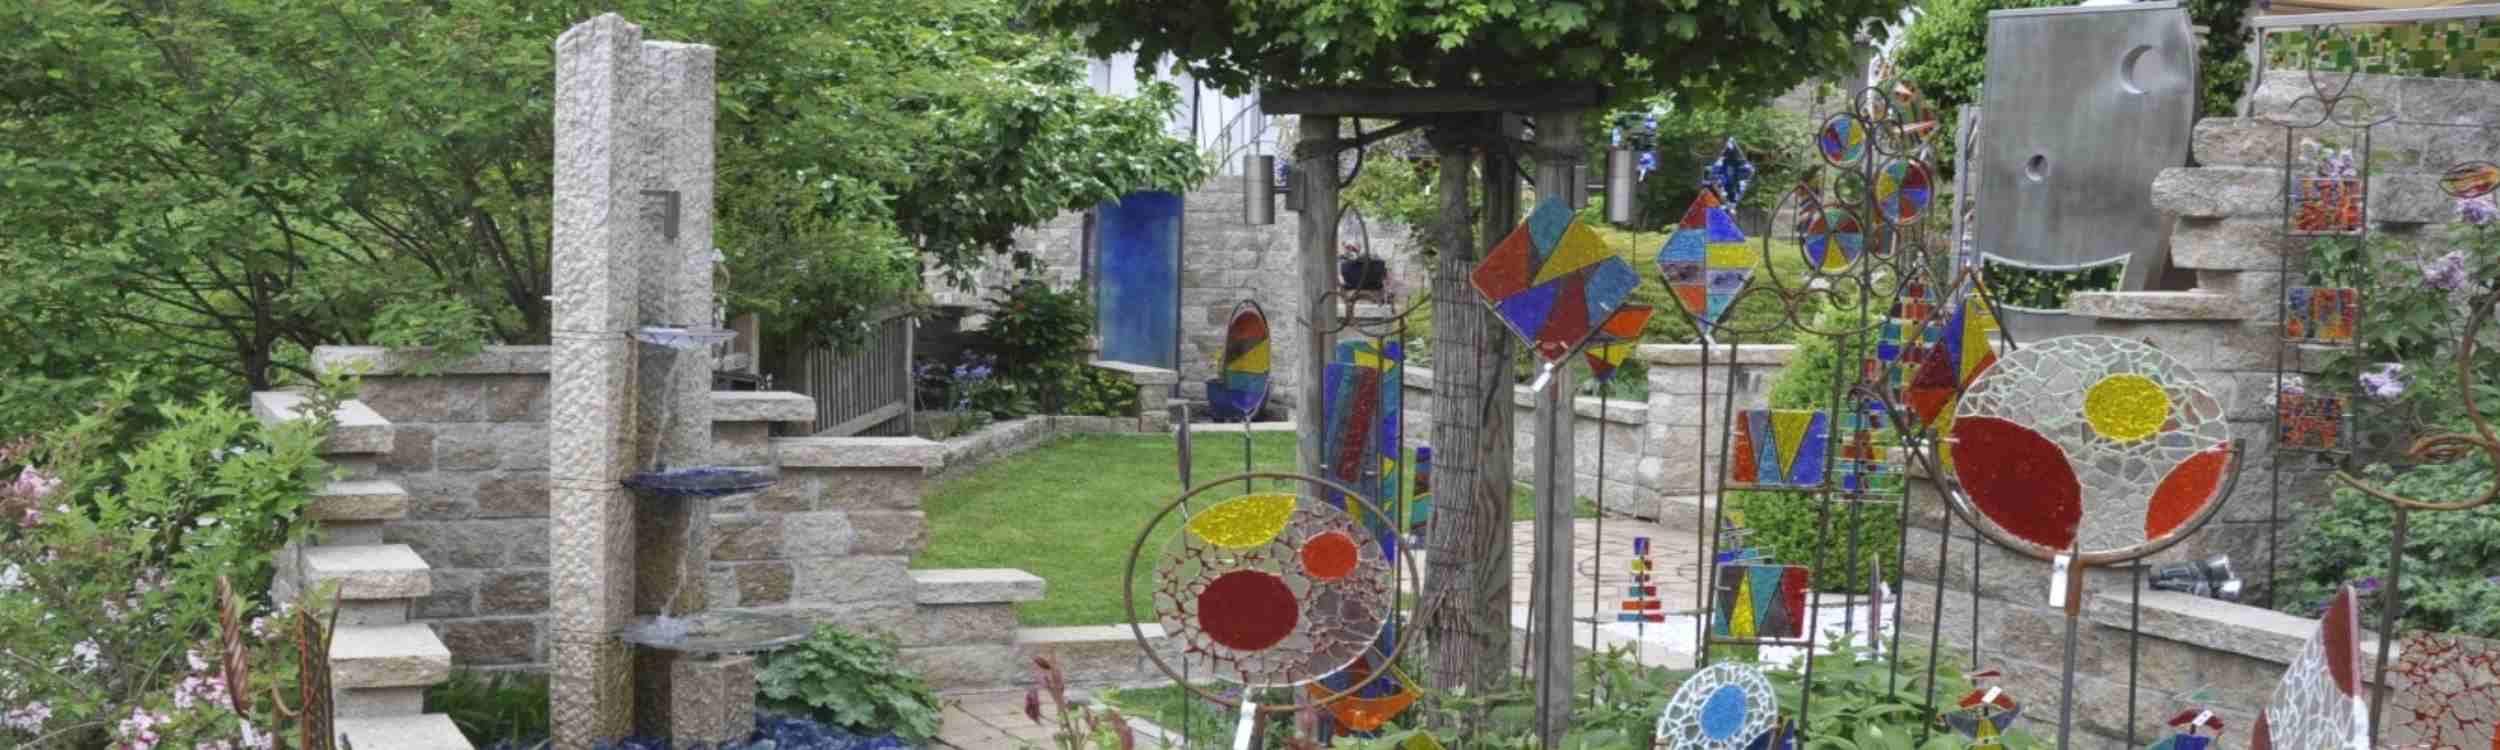 glas stadl die glasfusing manufaktur,fusing glas krativ seminare, Garten ideen